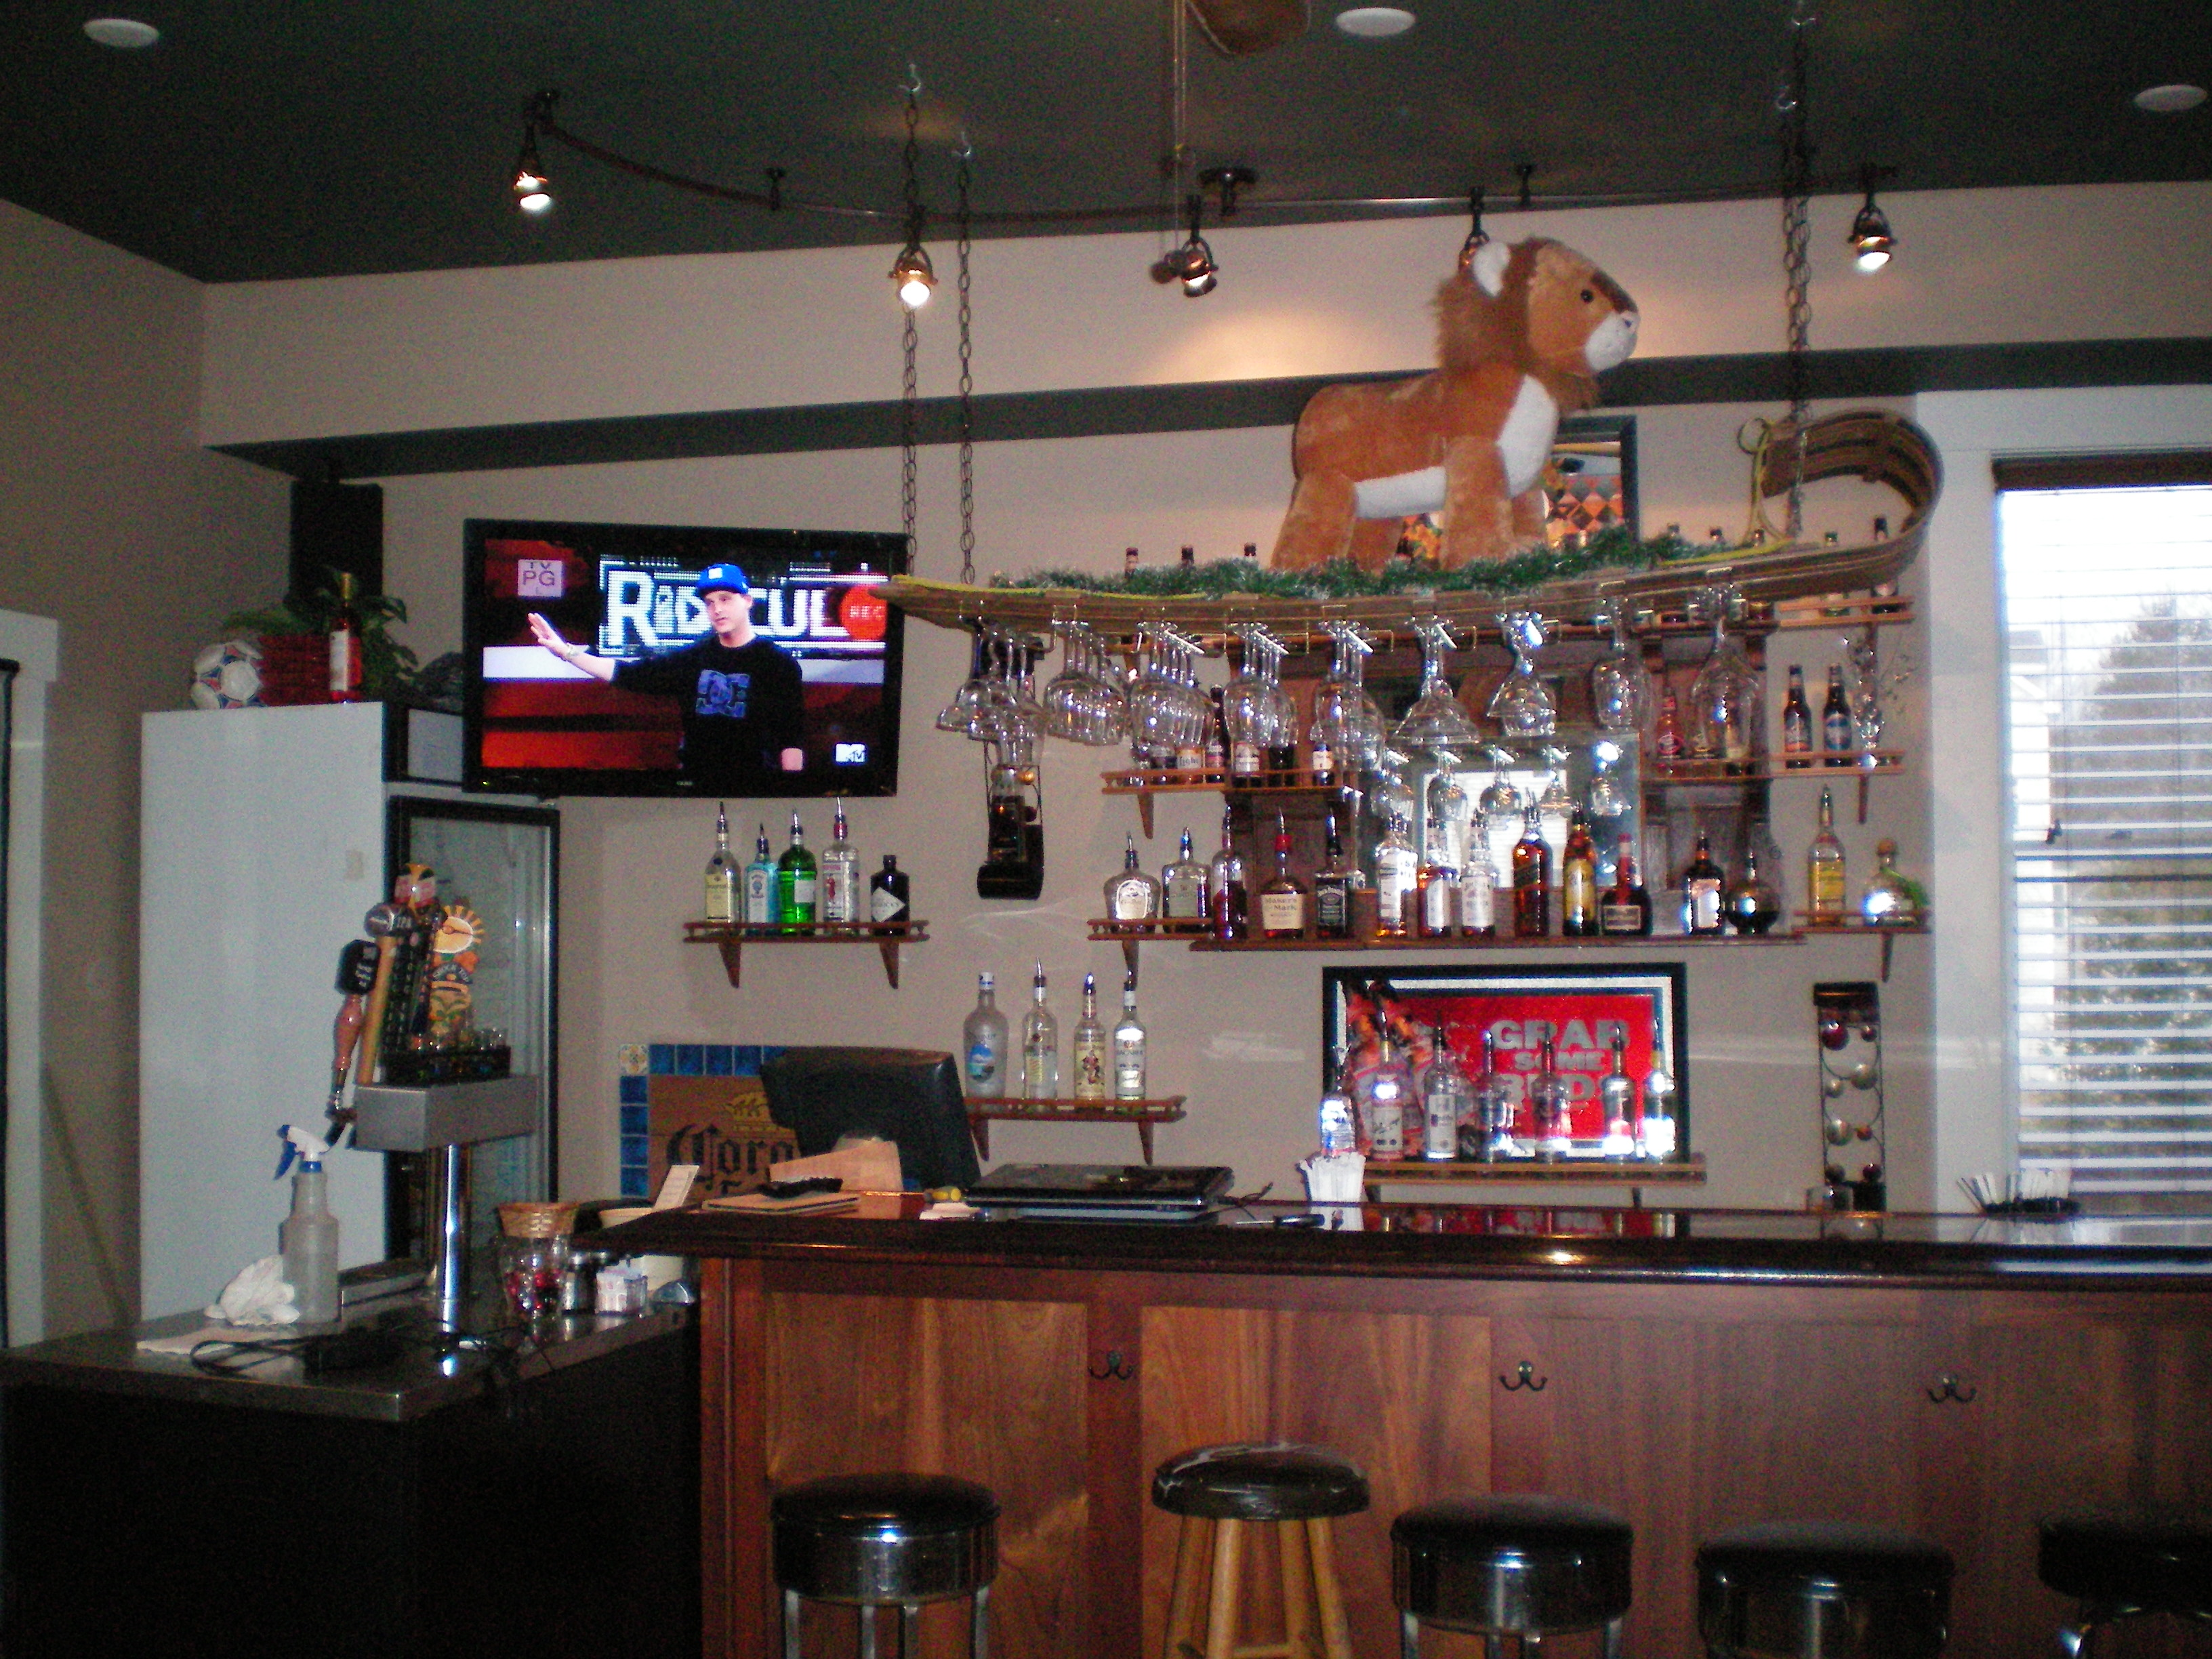 Beer tap systems for home - Beer Tap Systems For Home 12